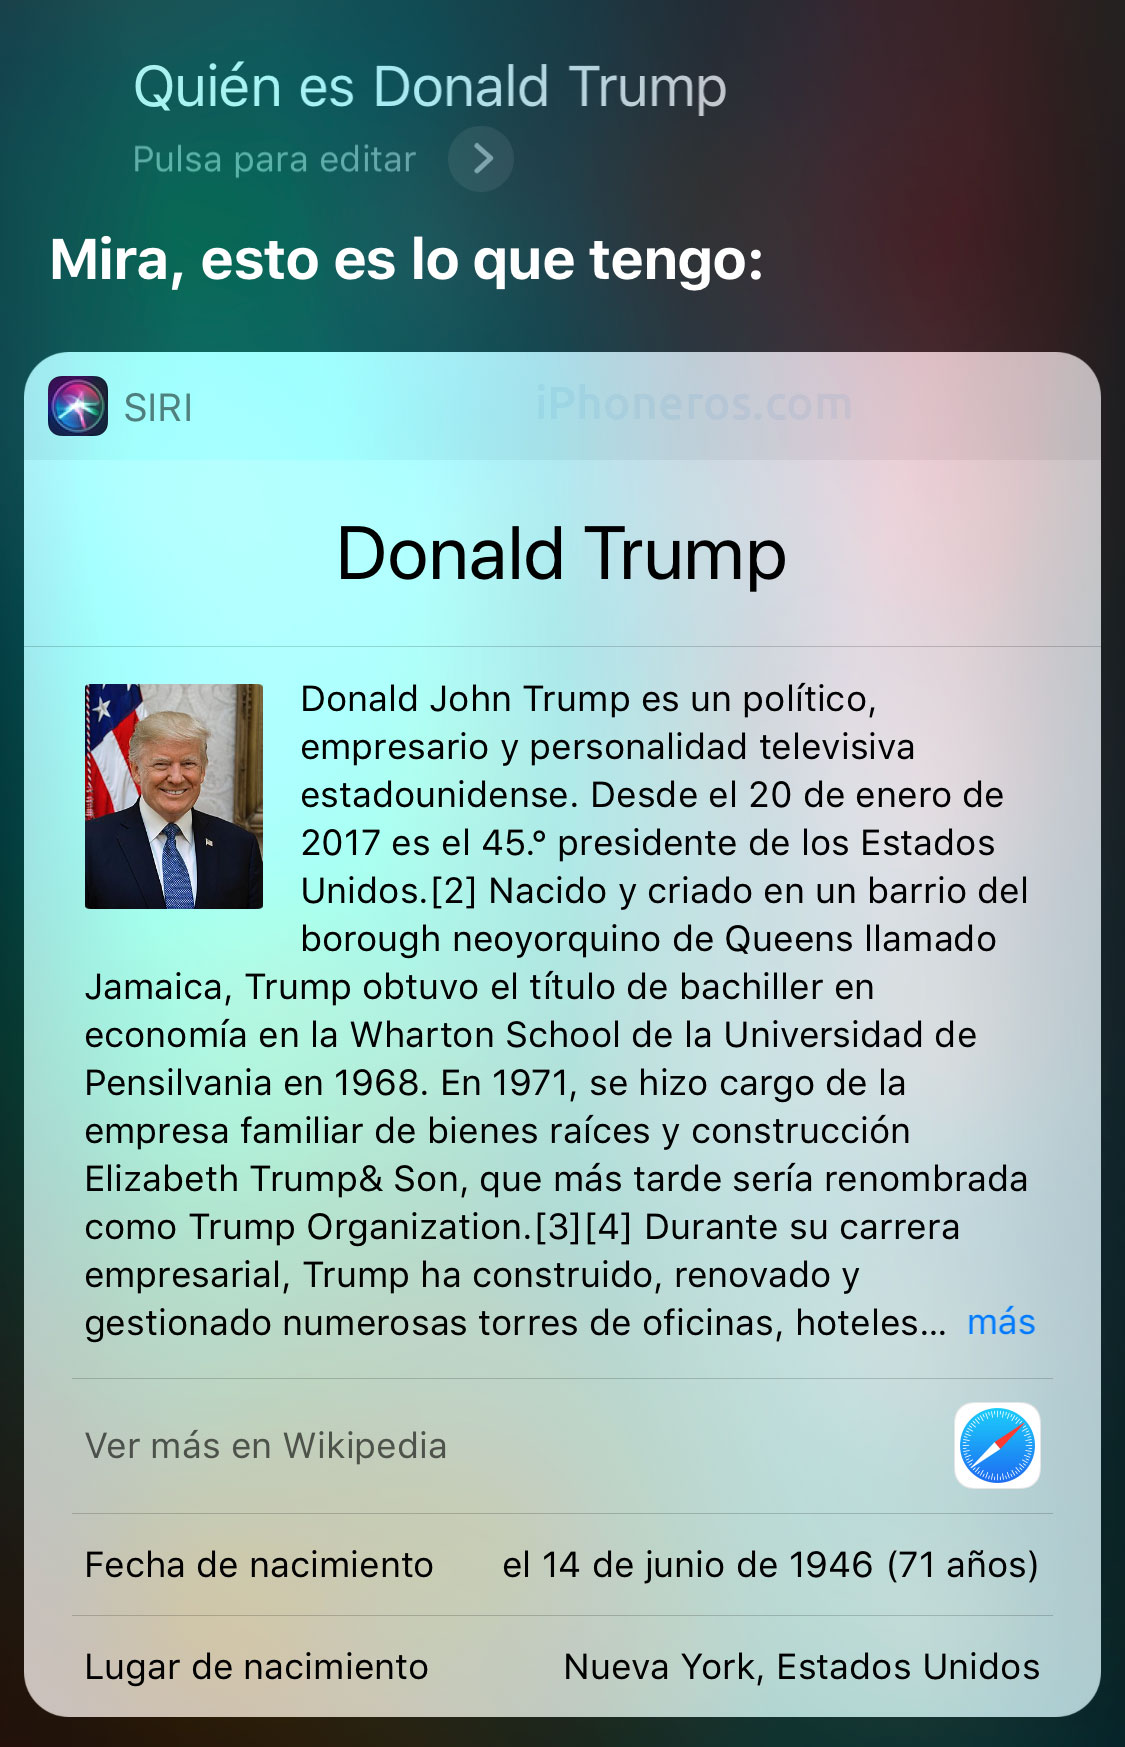 Siri sabe quién es Donald Trump